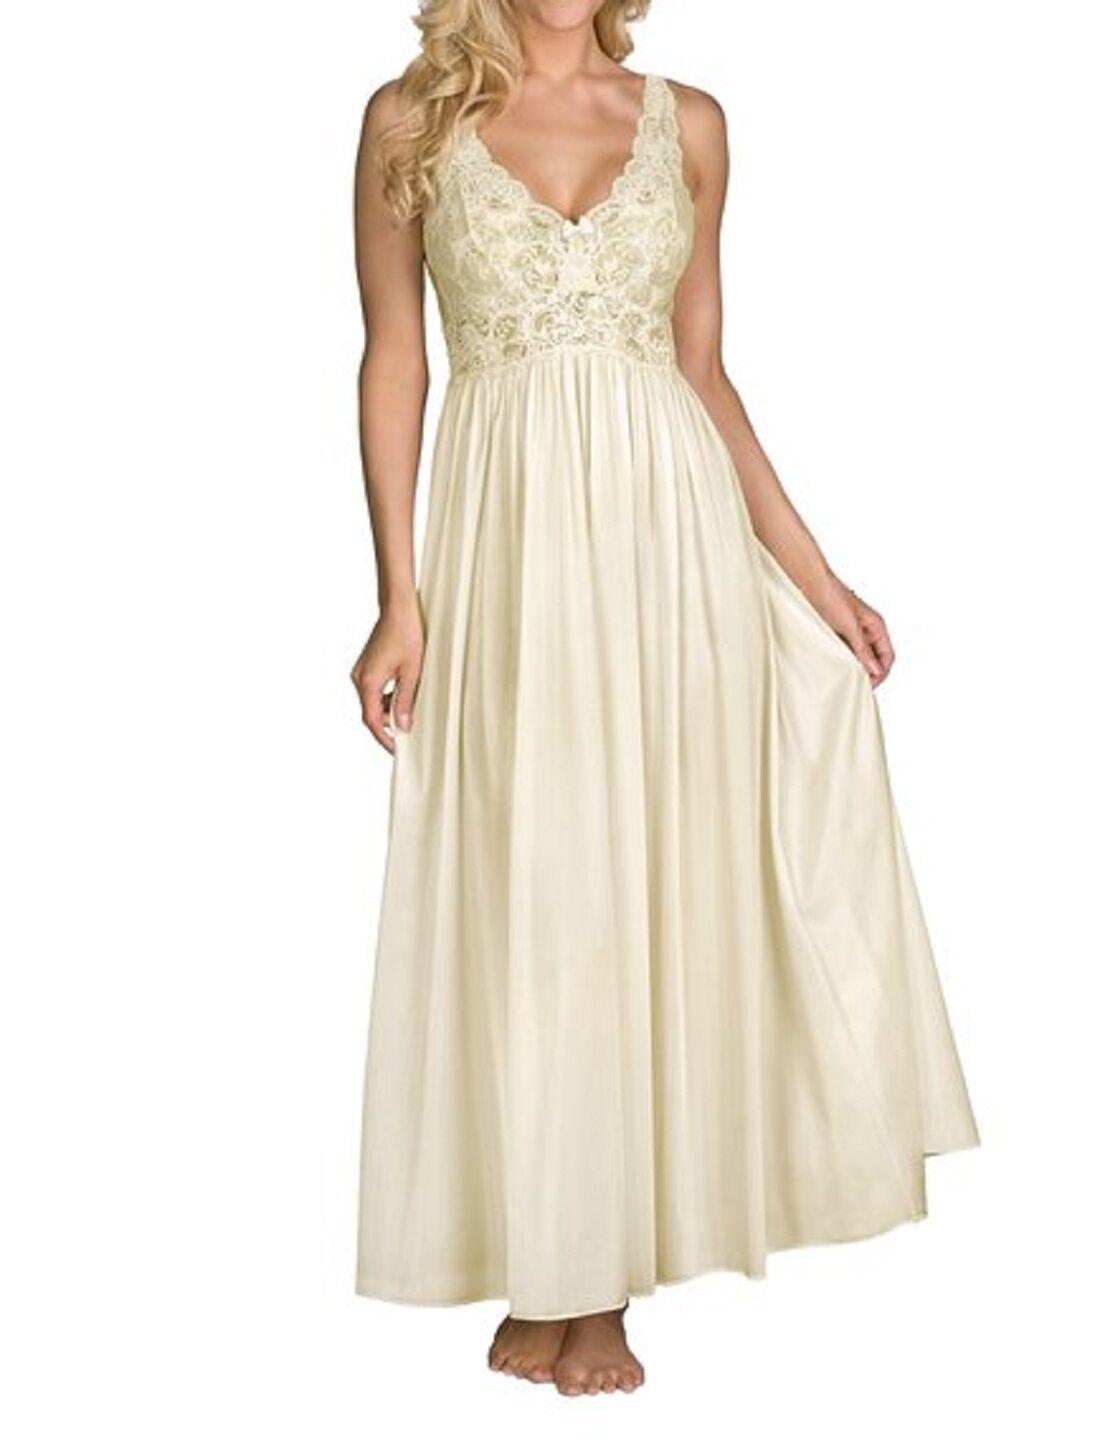 Shadowline Women's Silhouette 53 Inch Sleeveless Long Gown - 31737